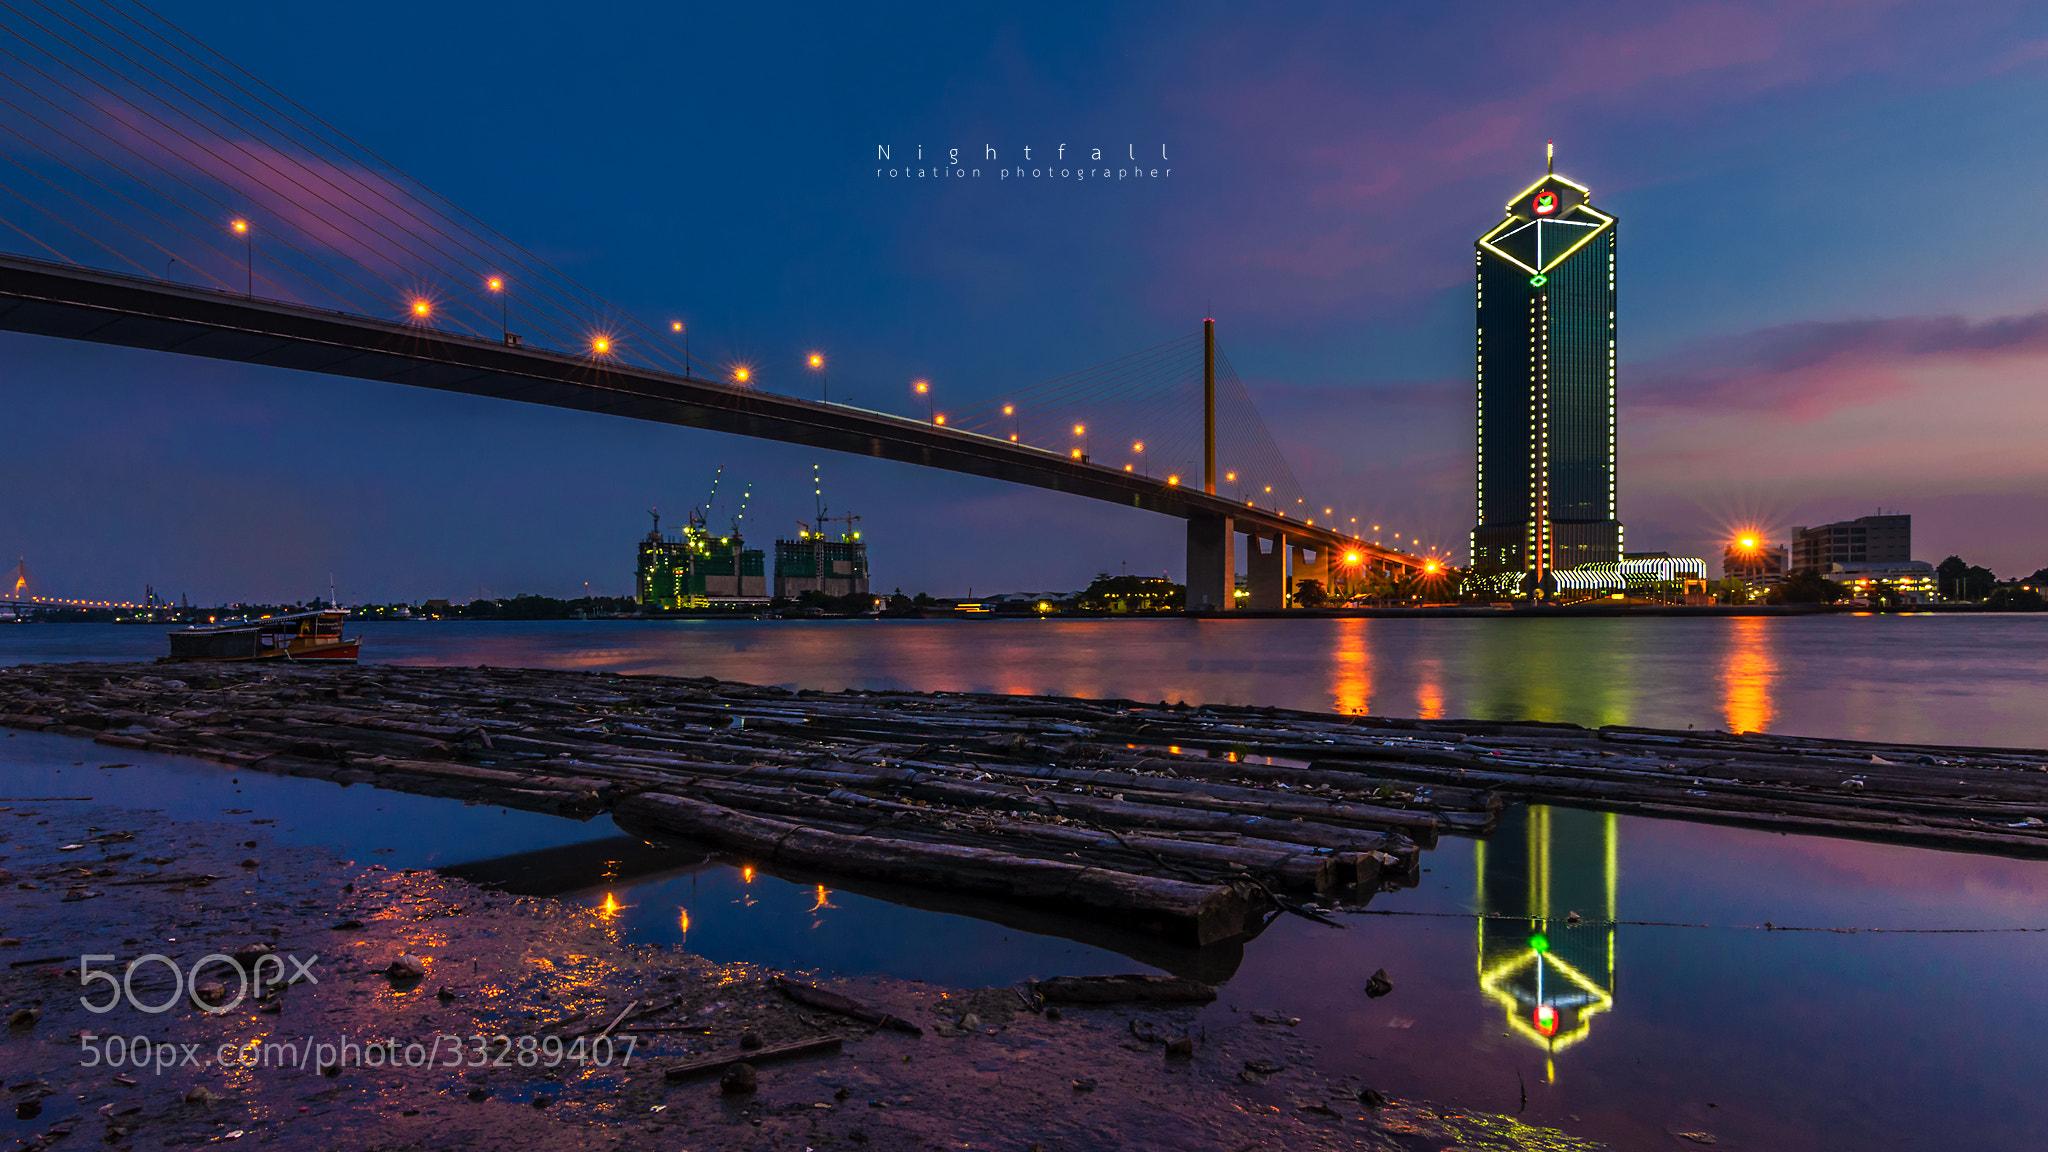 Photograph Nightfall by Jirawas Teekayu on 500px